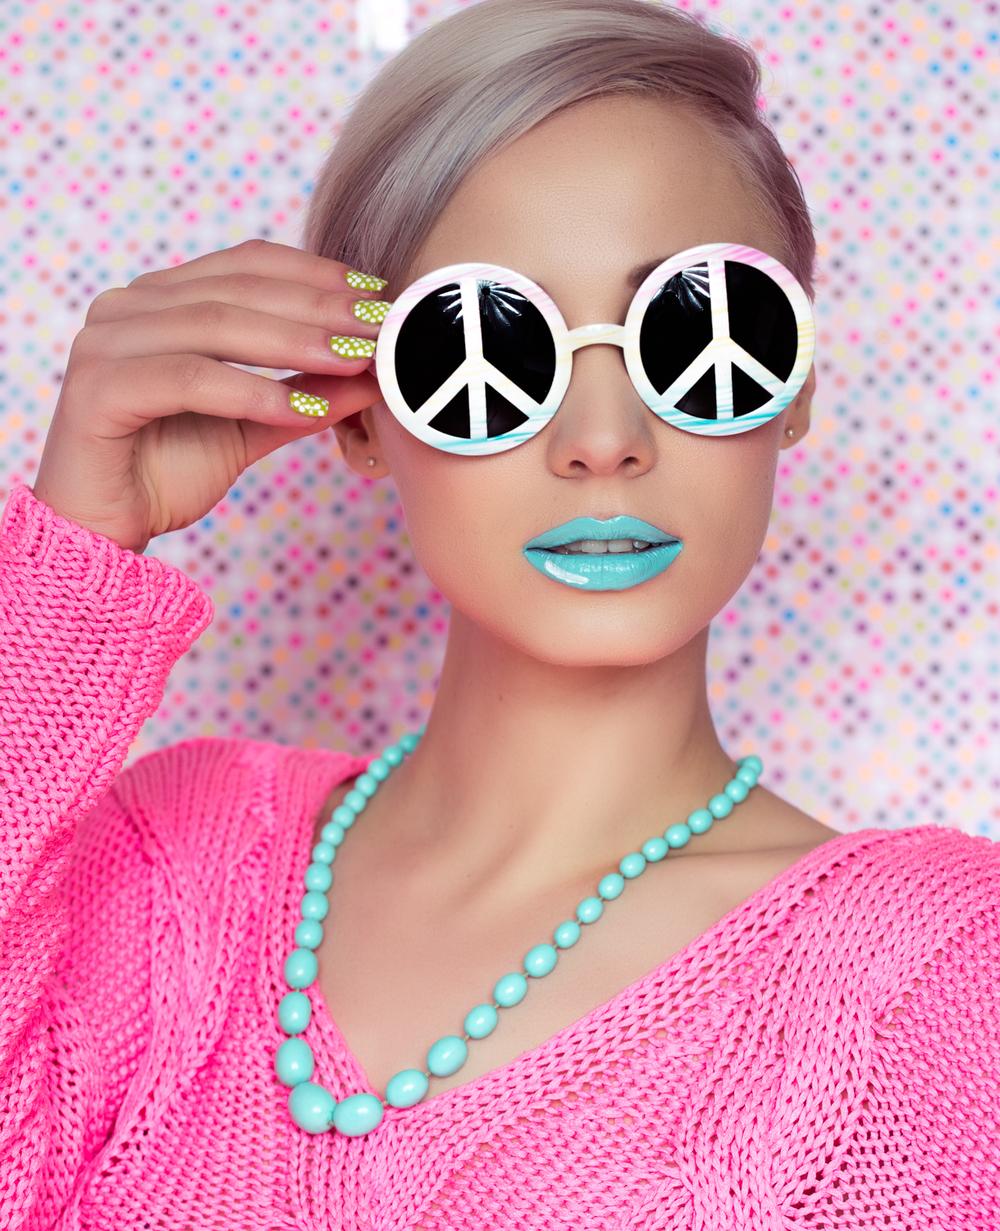 K14_0496-13-Kamal Mostofi-Beauty_ZyZi Makeup_Sally_80s-Edit.jpg